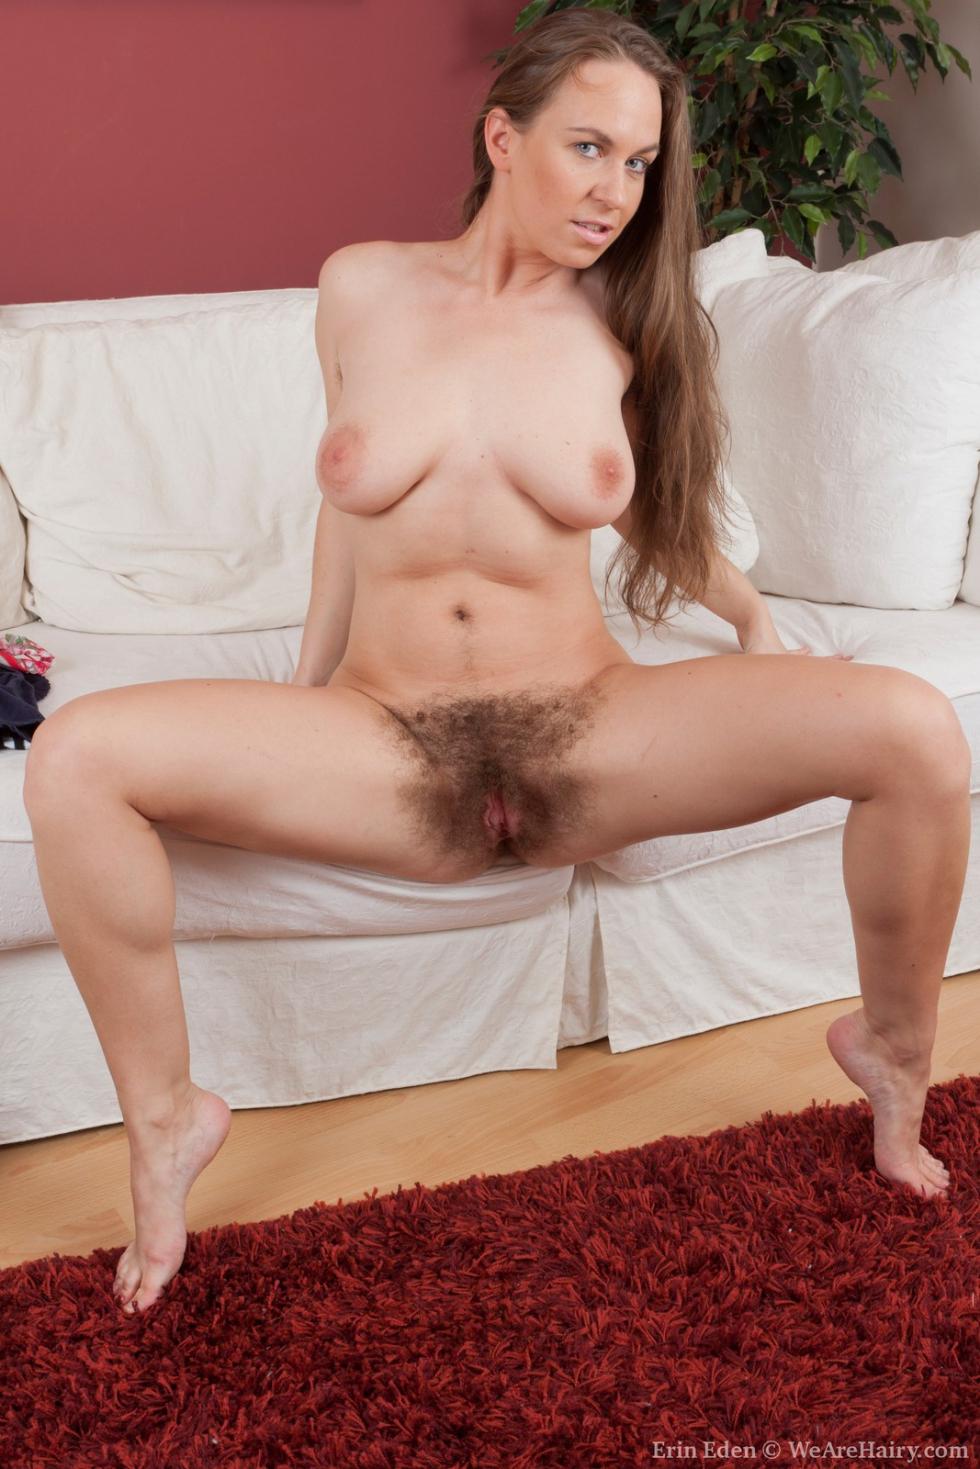 Hairy erin eden